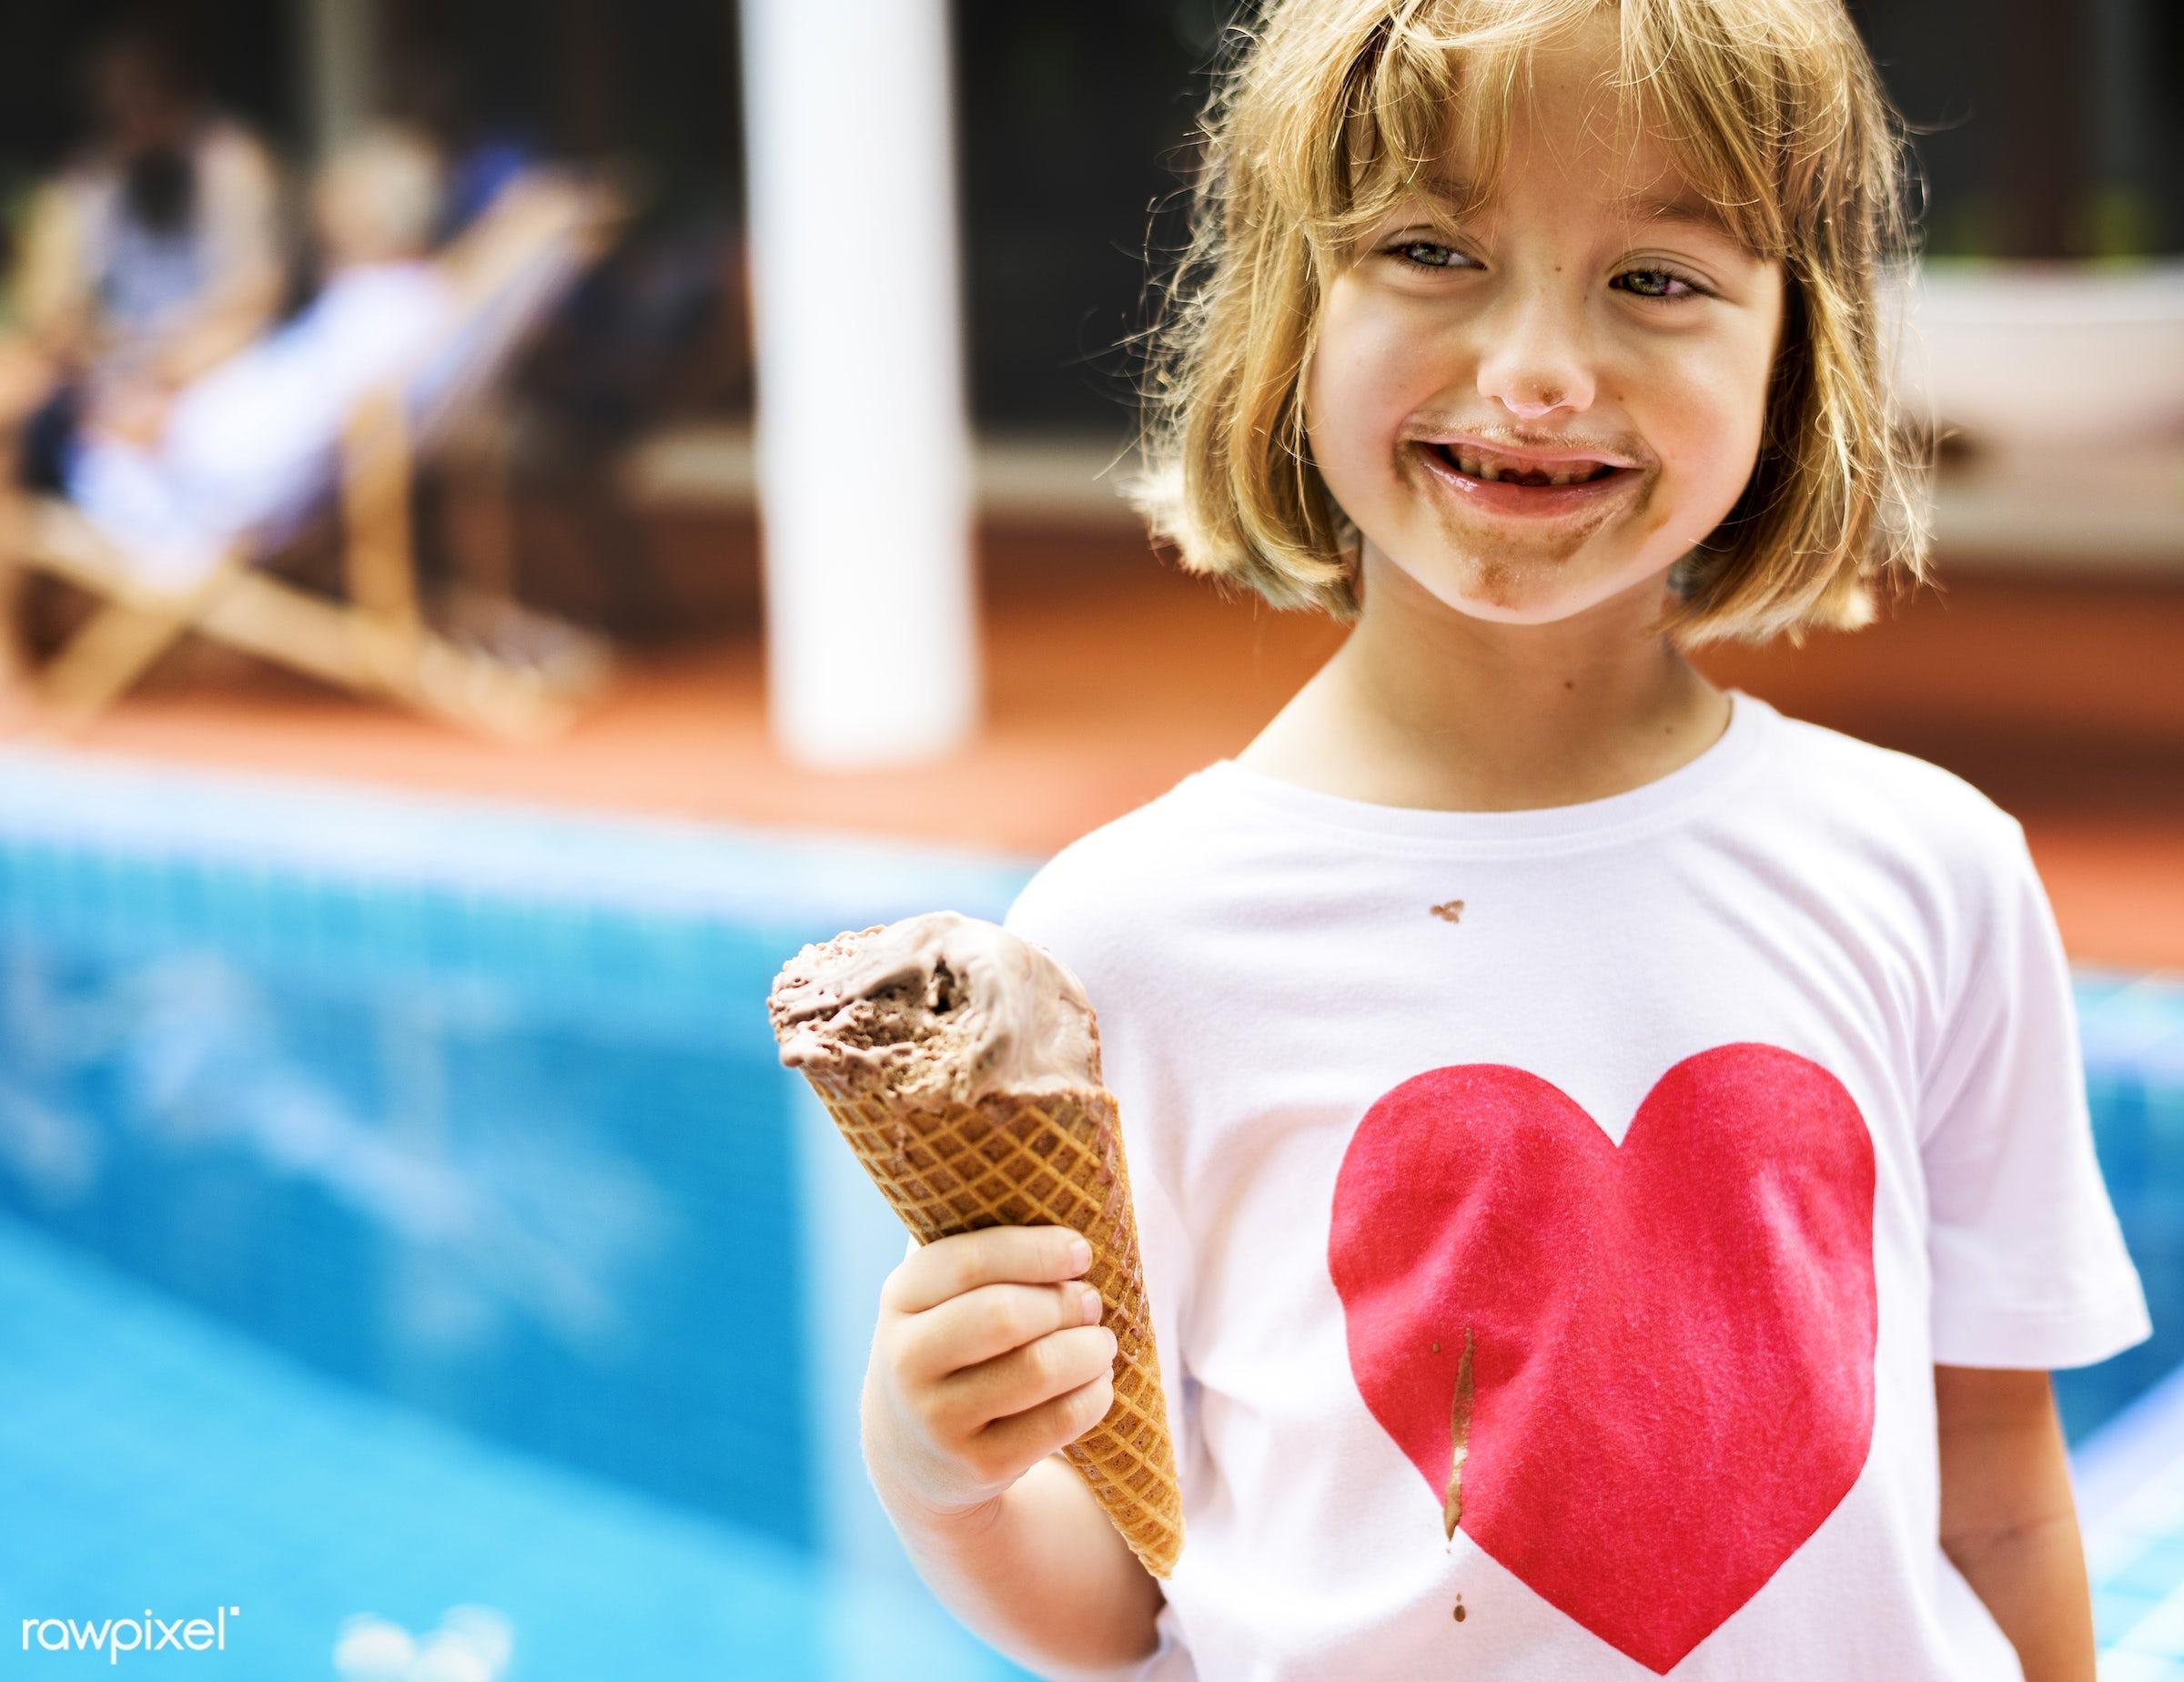 playful, joy, children, swimming pool, people, kid, caucasian, child, girl, happy, lifestyle, casual, childhood, cheerful,...